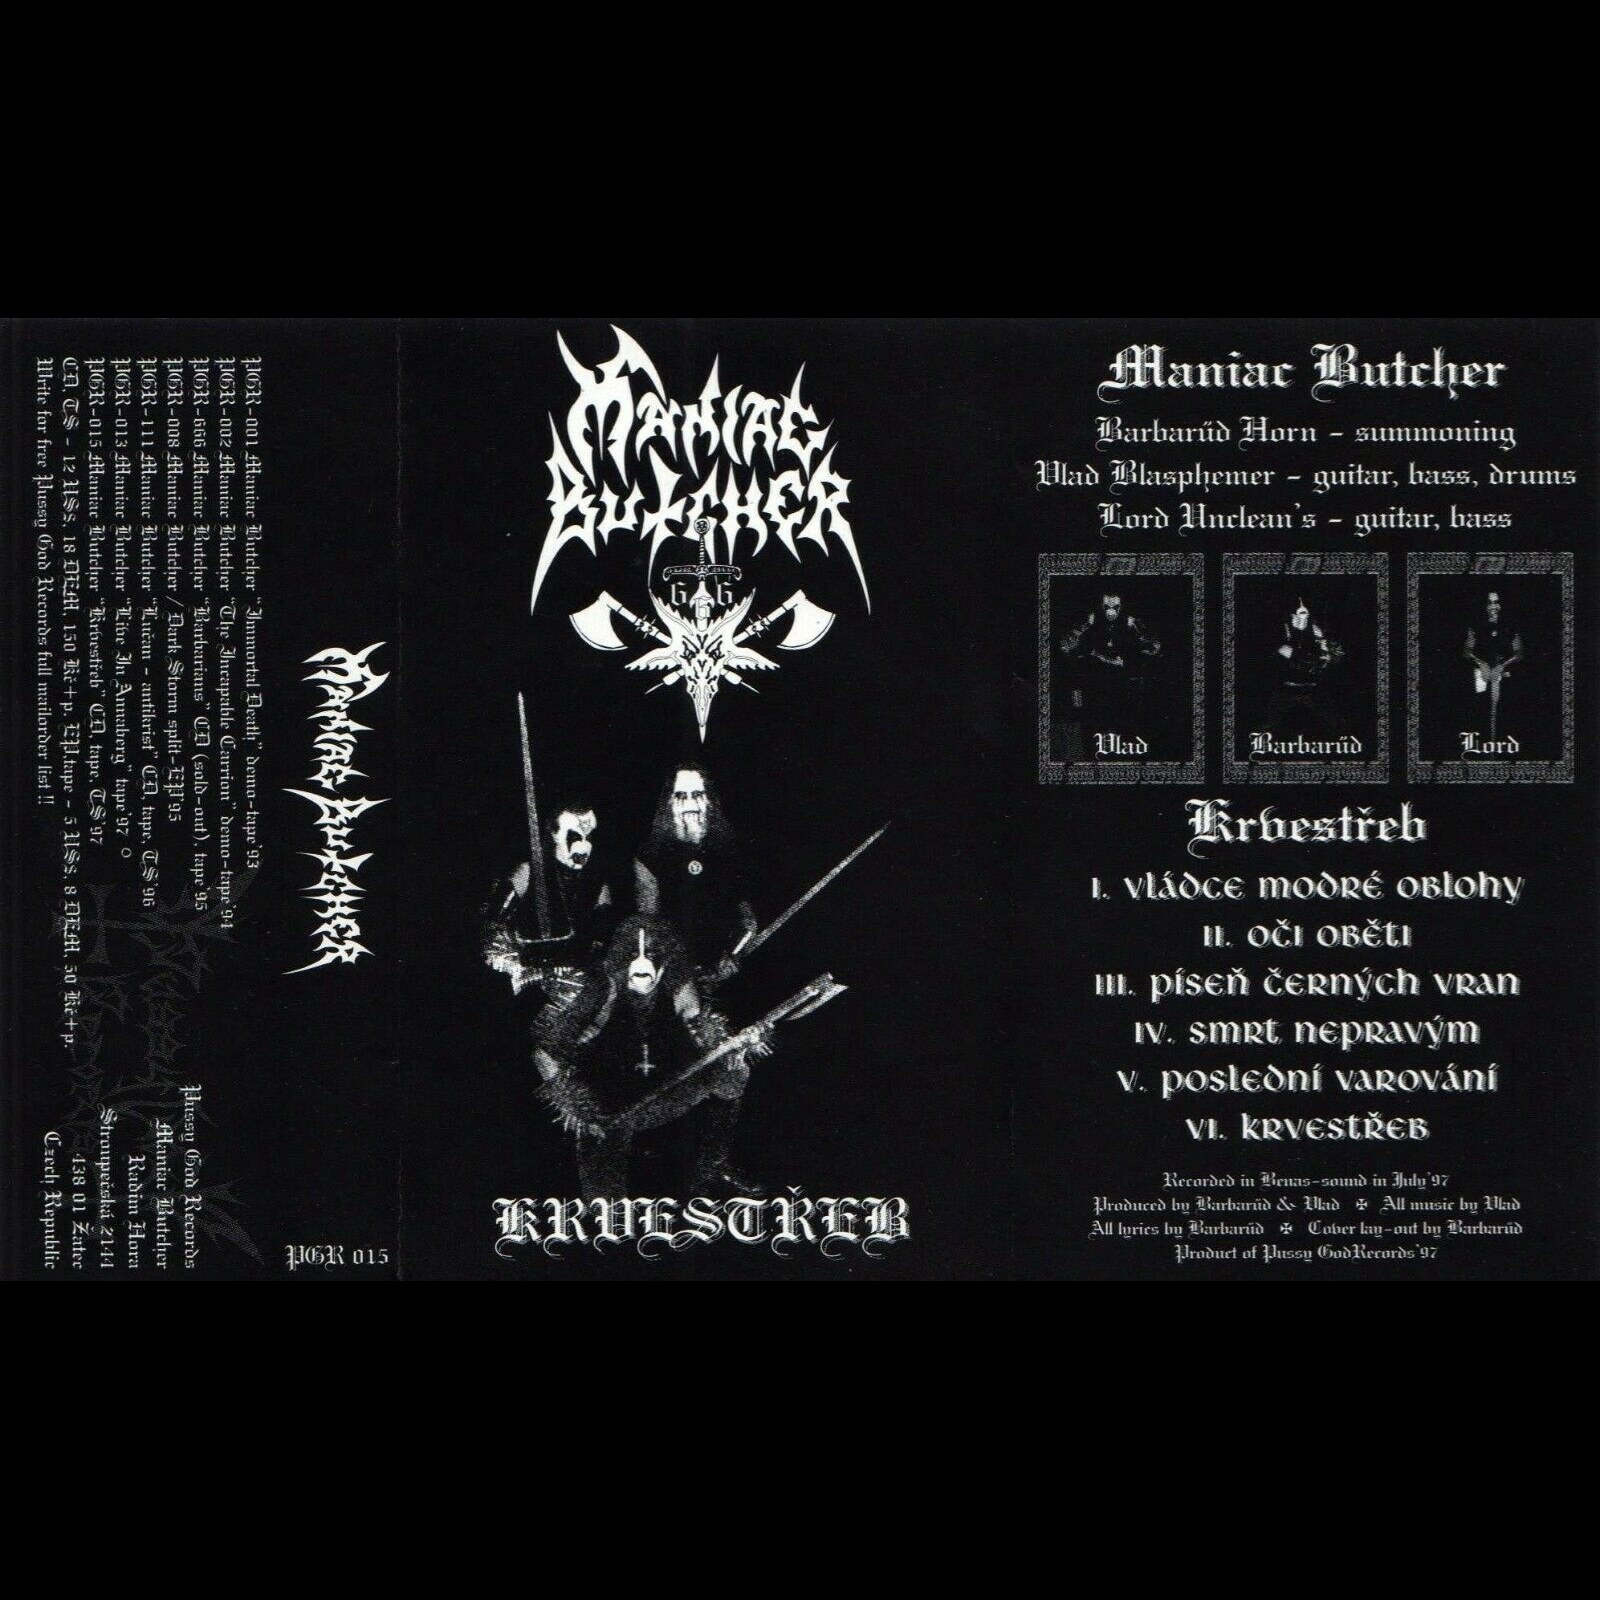 Review for Maniac Butcher - Krvestřeb